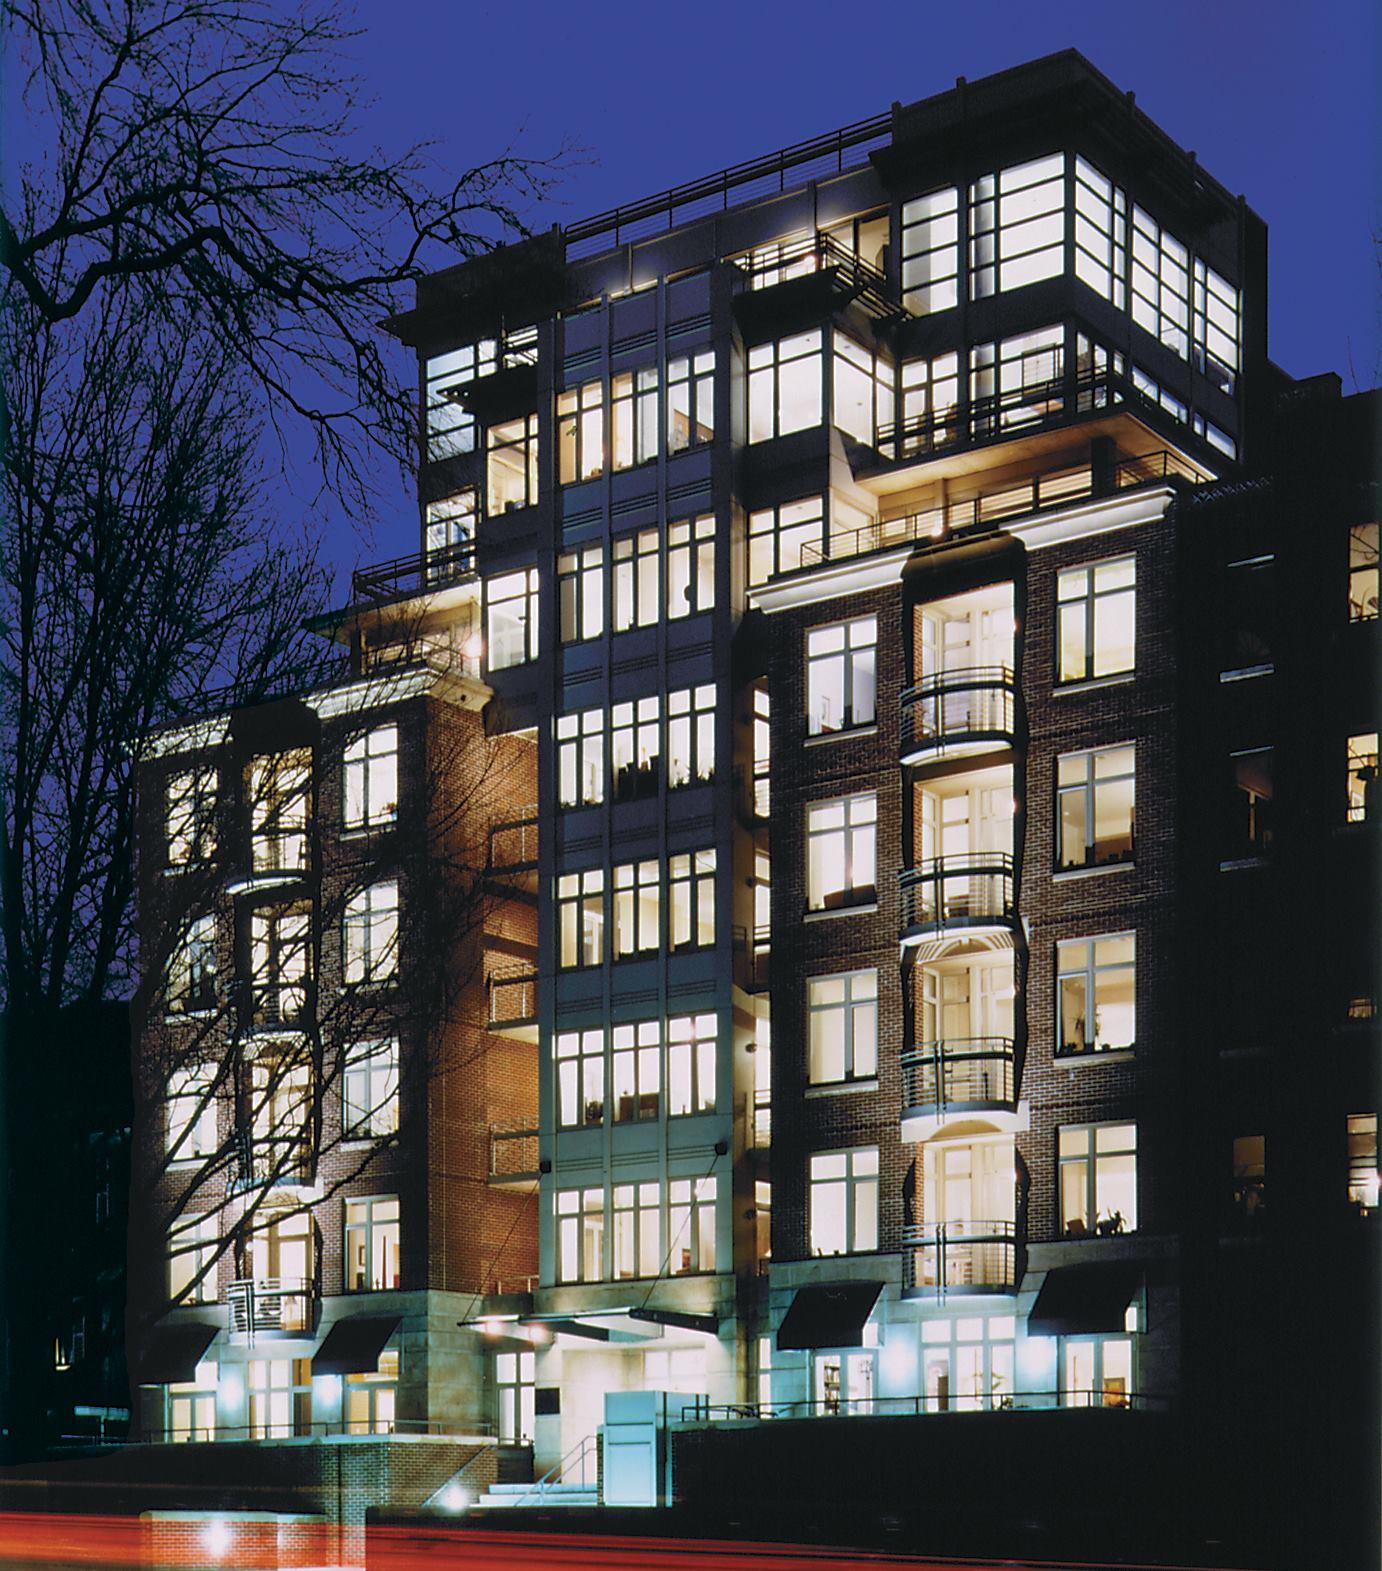 Park hill north condominiums washington d c for Residential architect design awards